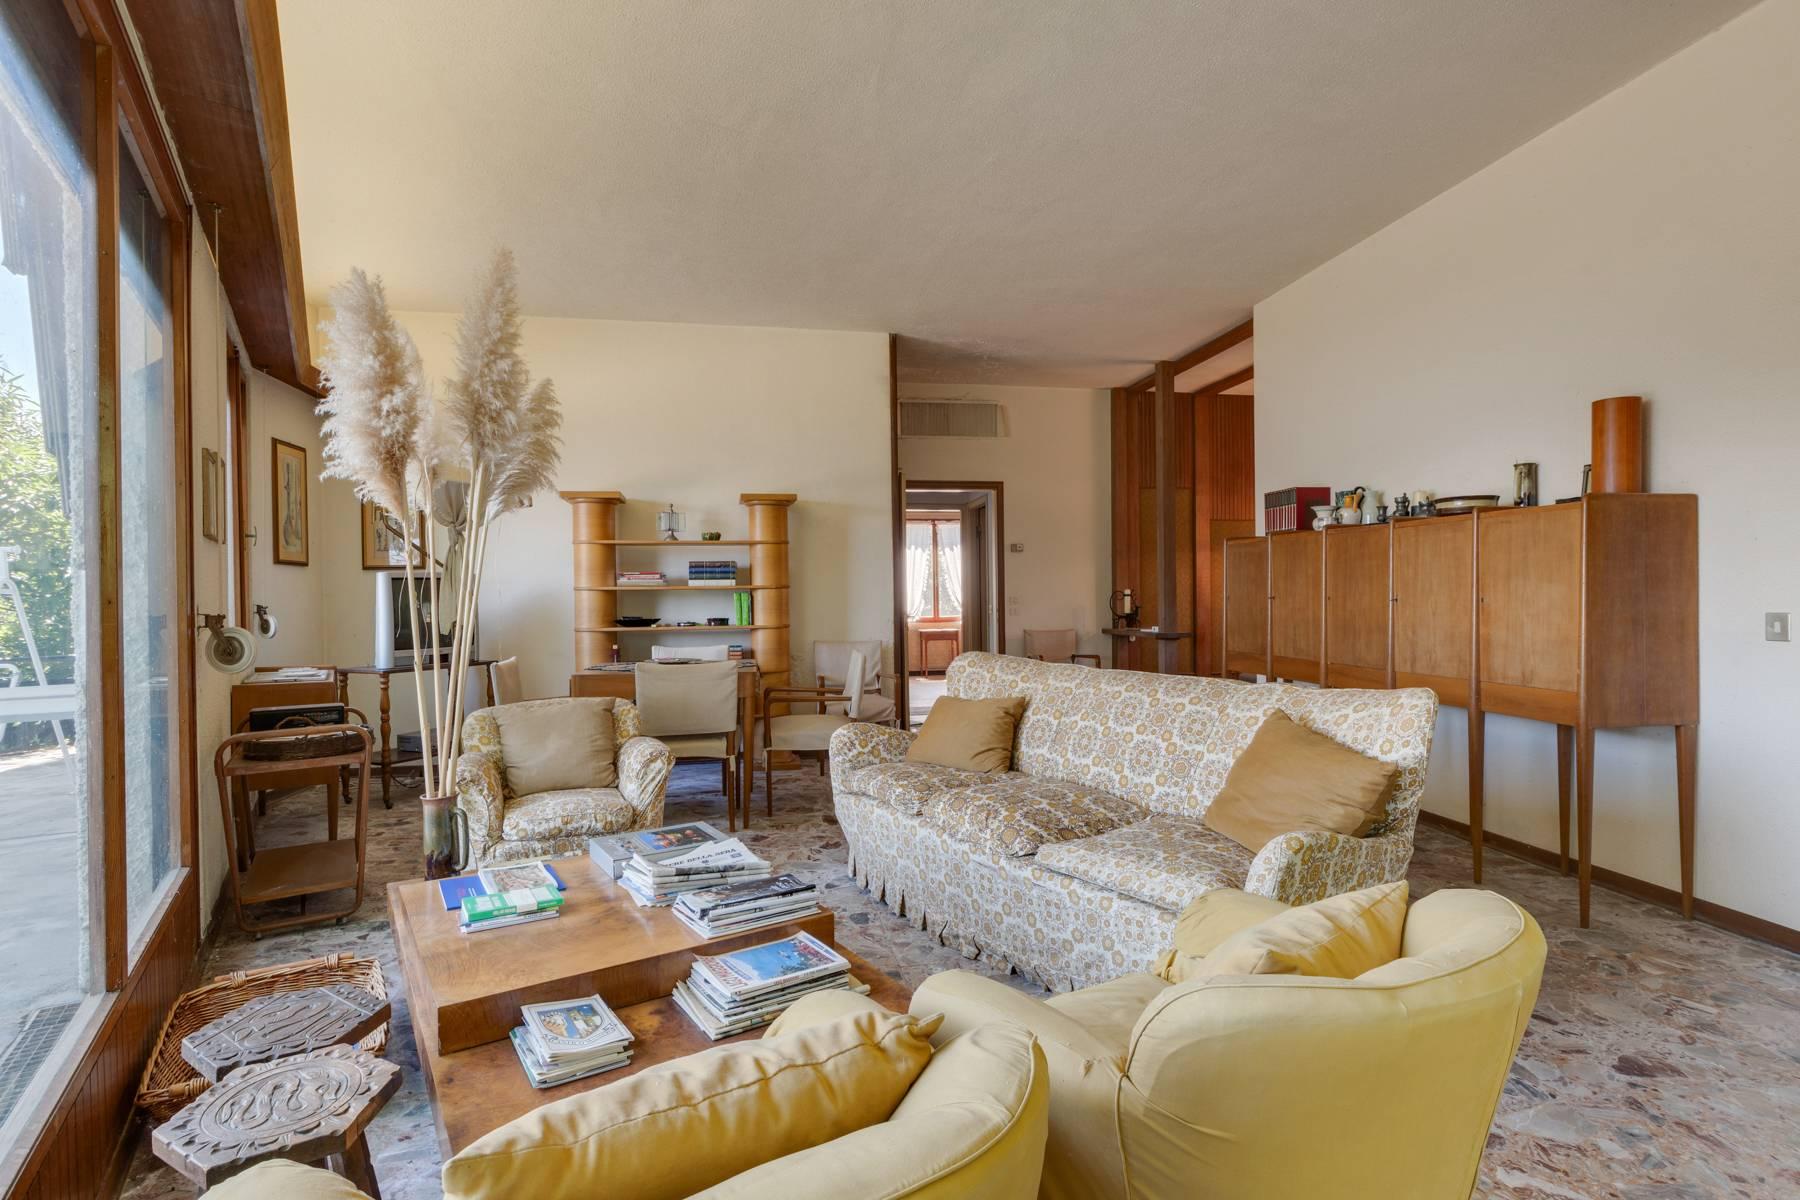 Villa in Vendita a Stresa: 5 locali, 150 mq - Foto 9